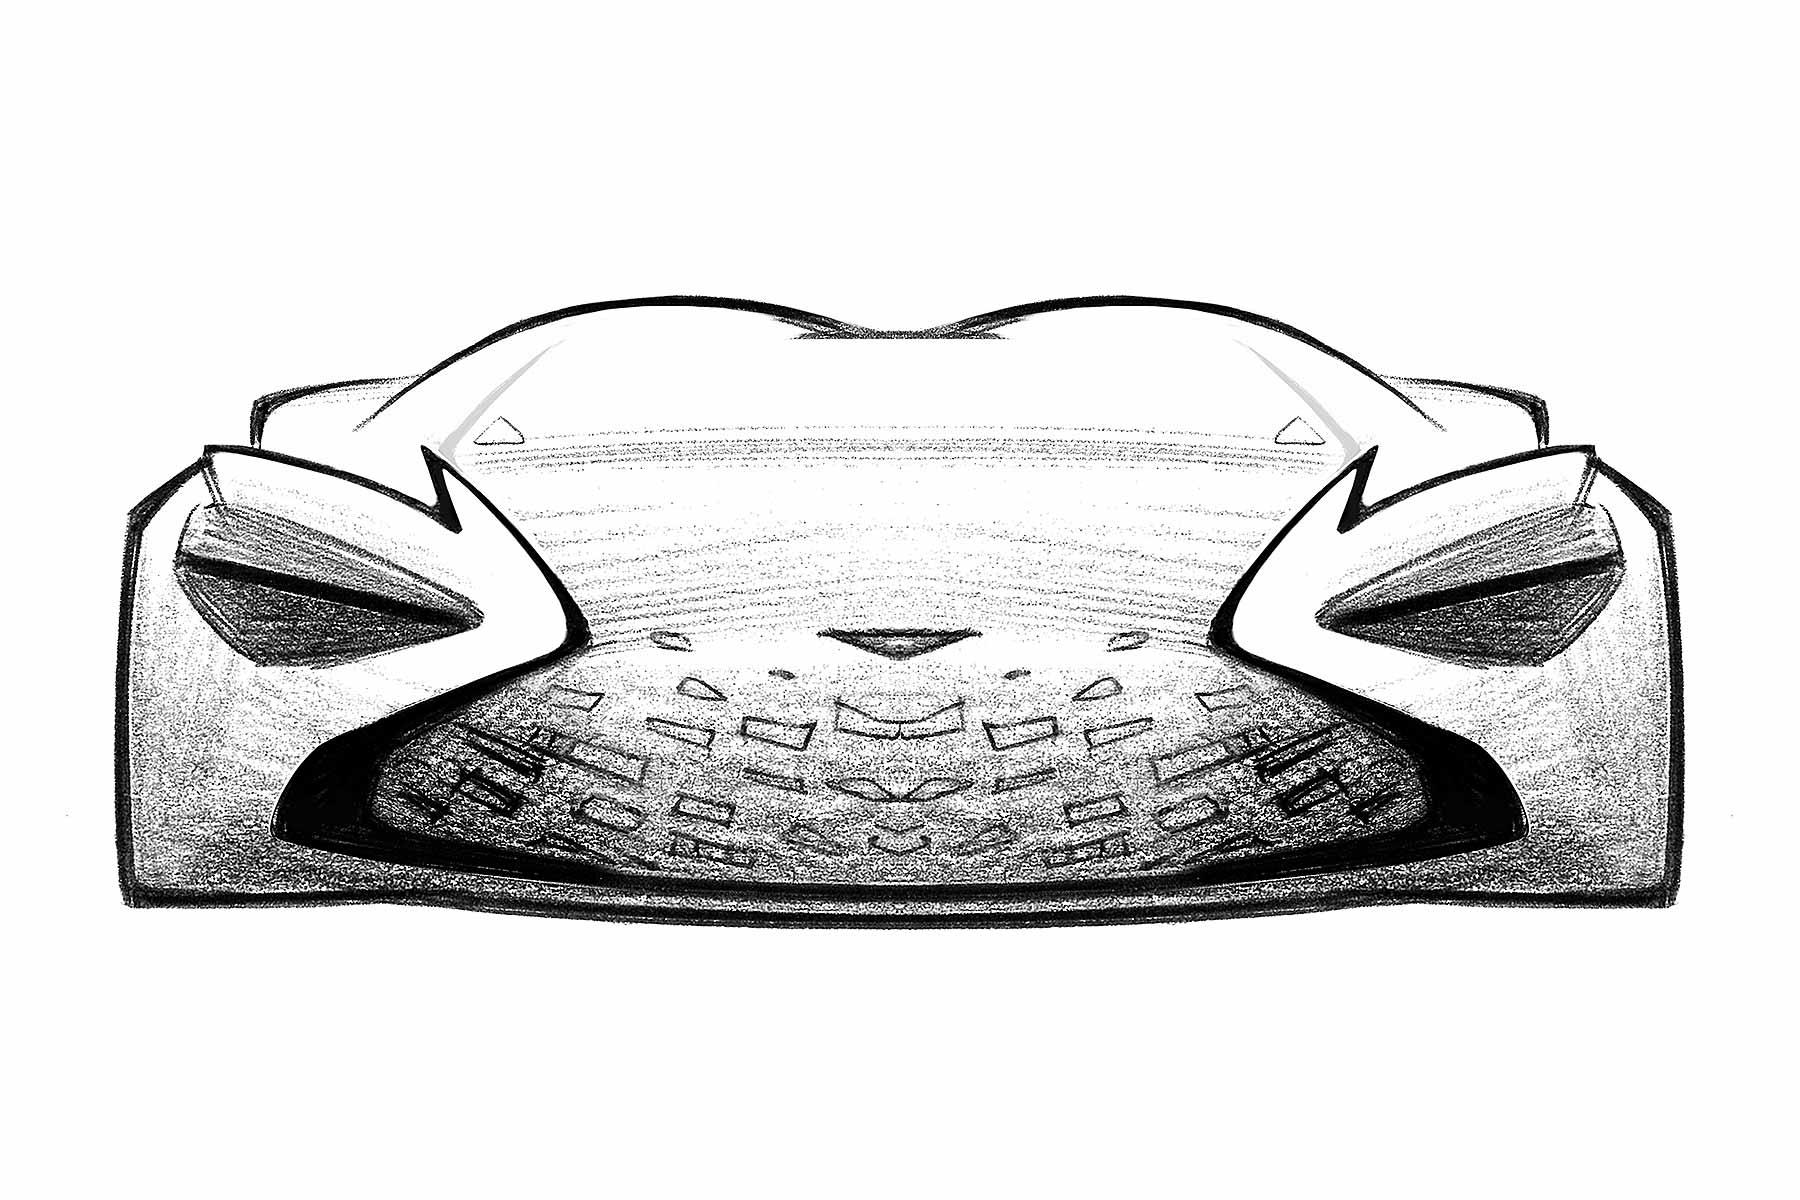 Aston Martin DBS GT Zagato Continuation